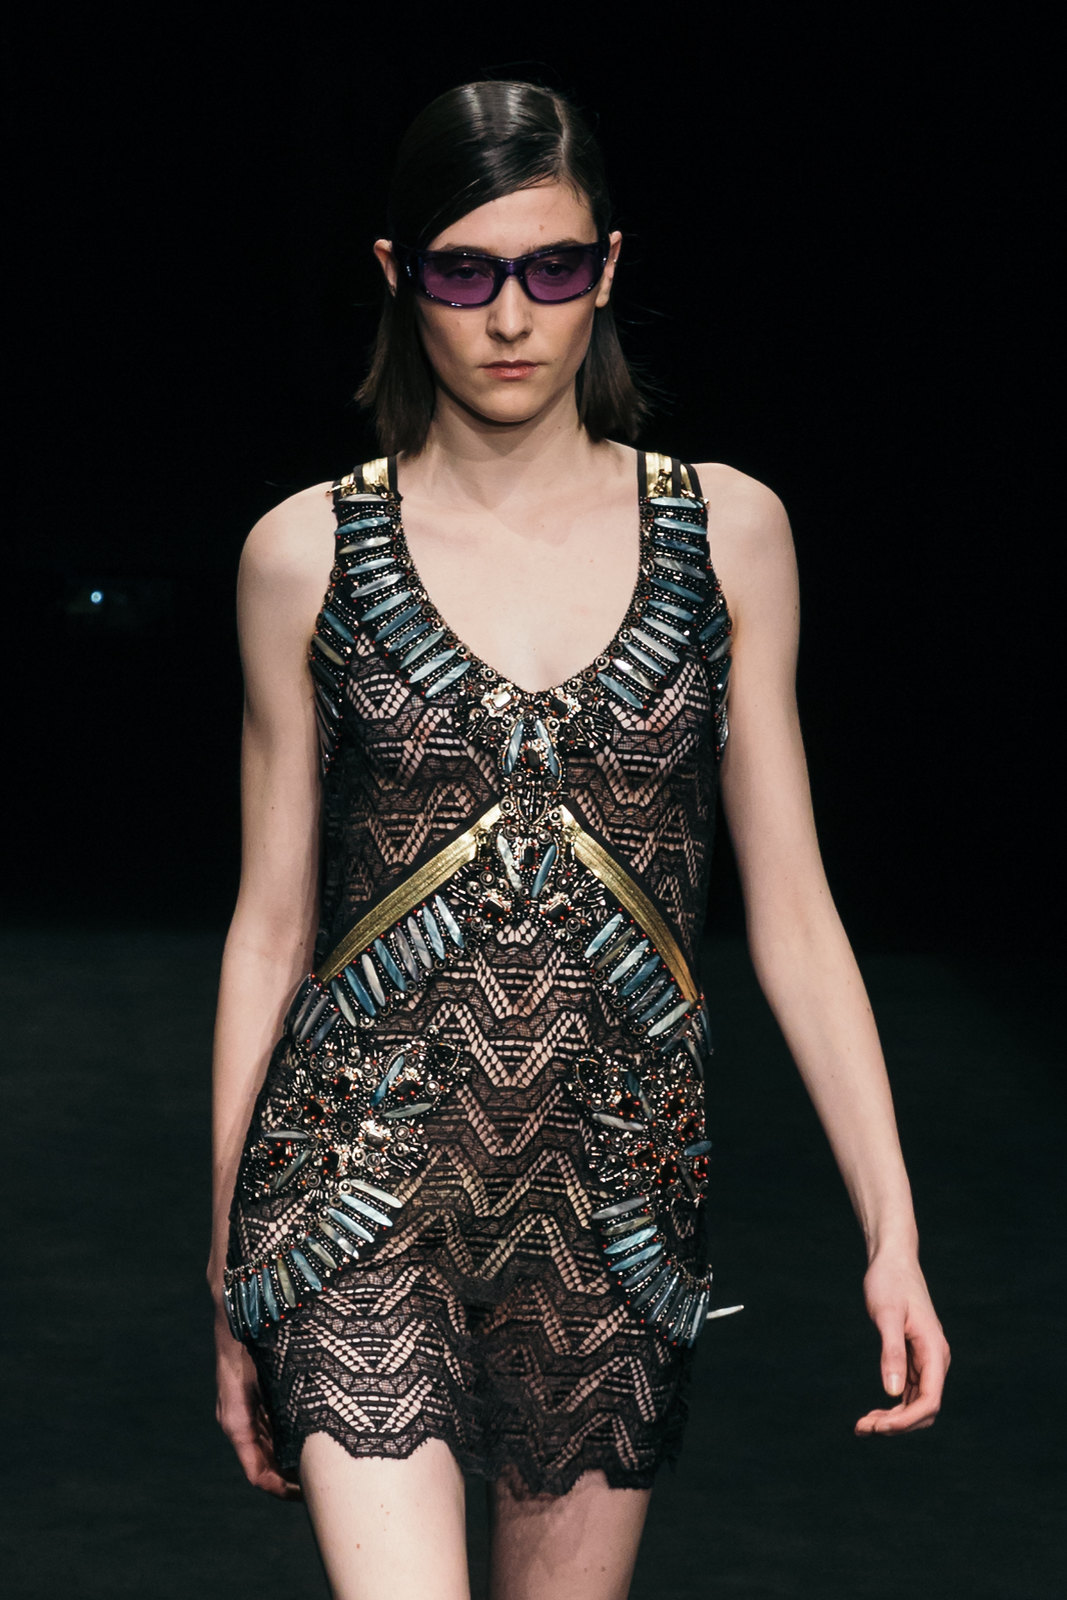 Jessie Chanes - Seams for a desire - 080 Bacelona Fashion #080bcnfasion -14